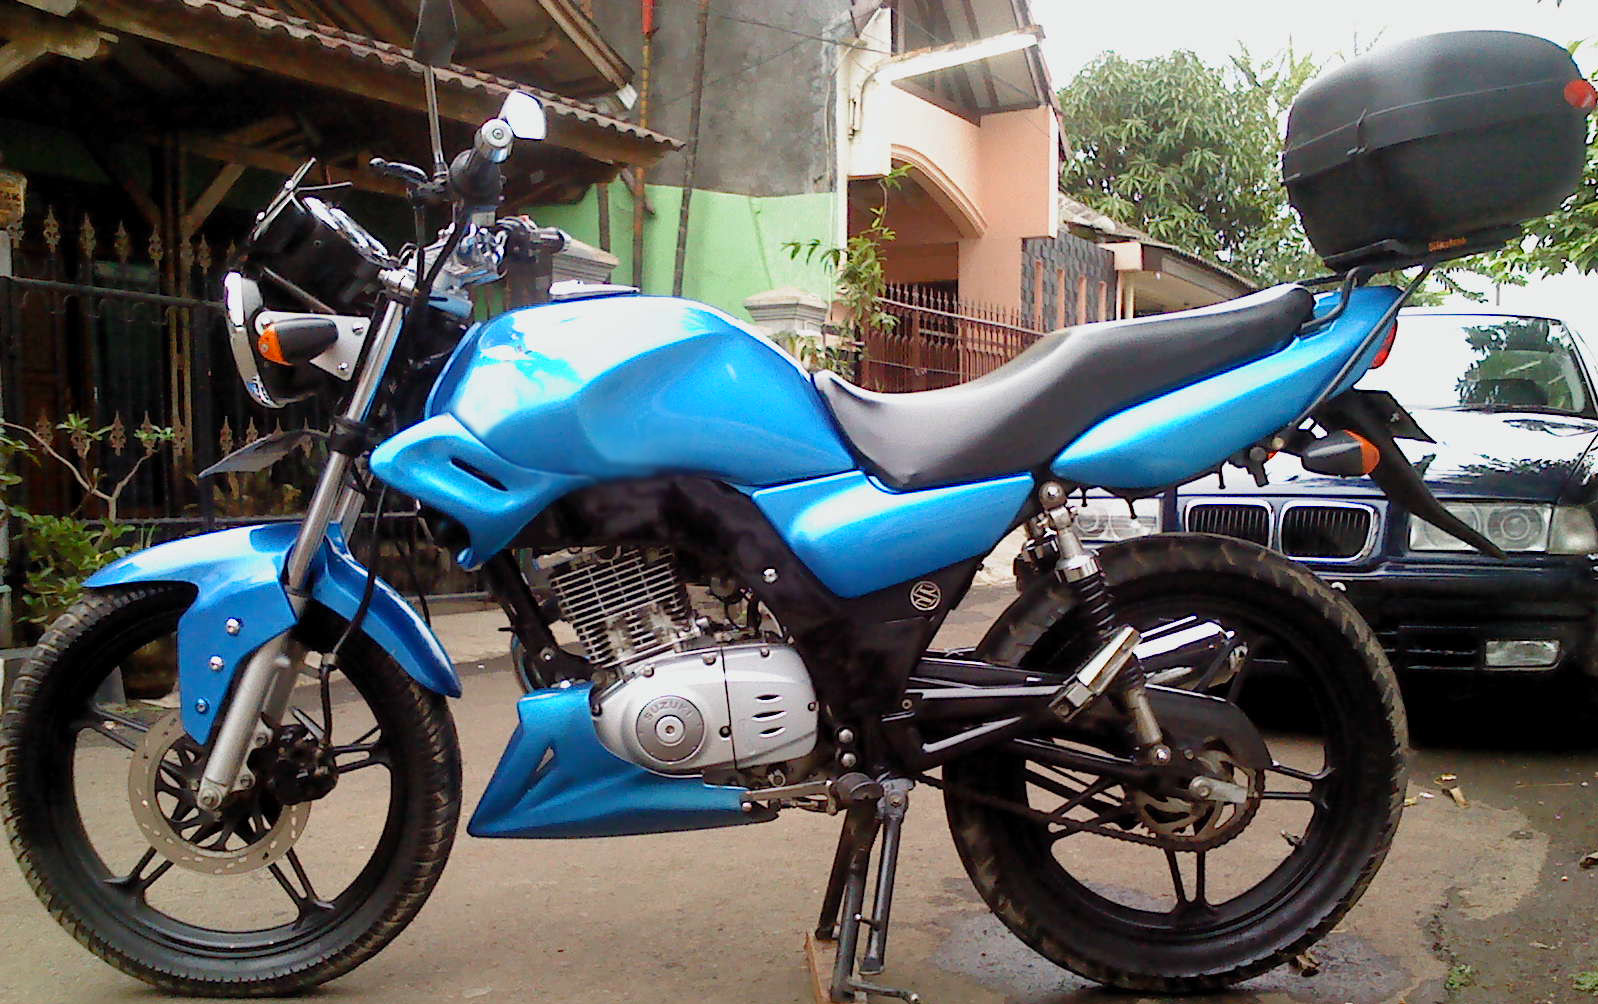 Modifikasi Sepeda Motor Suzuki Thunder Wacana Modif Motor